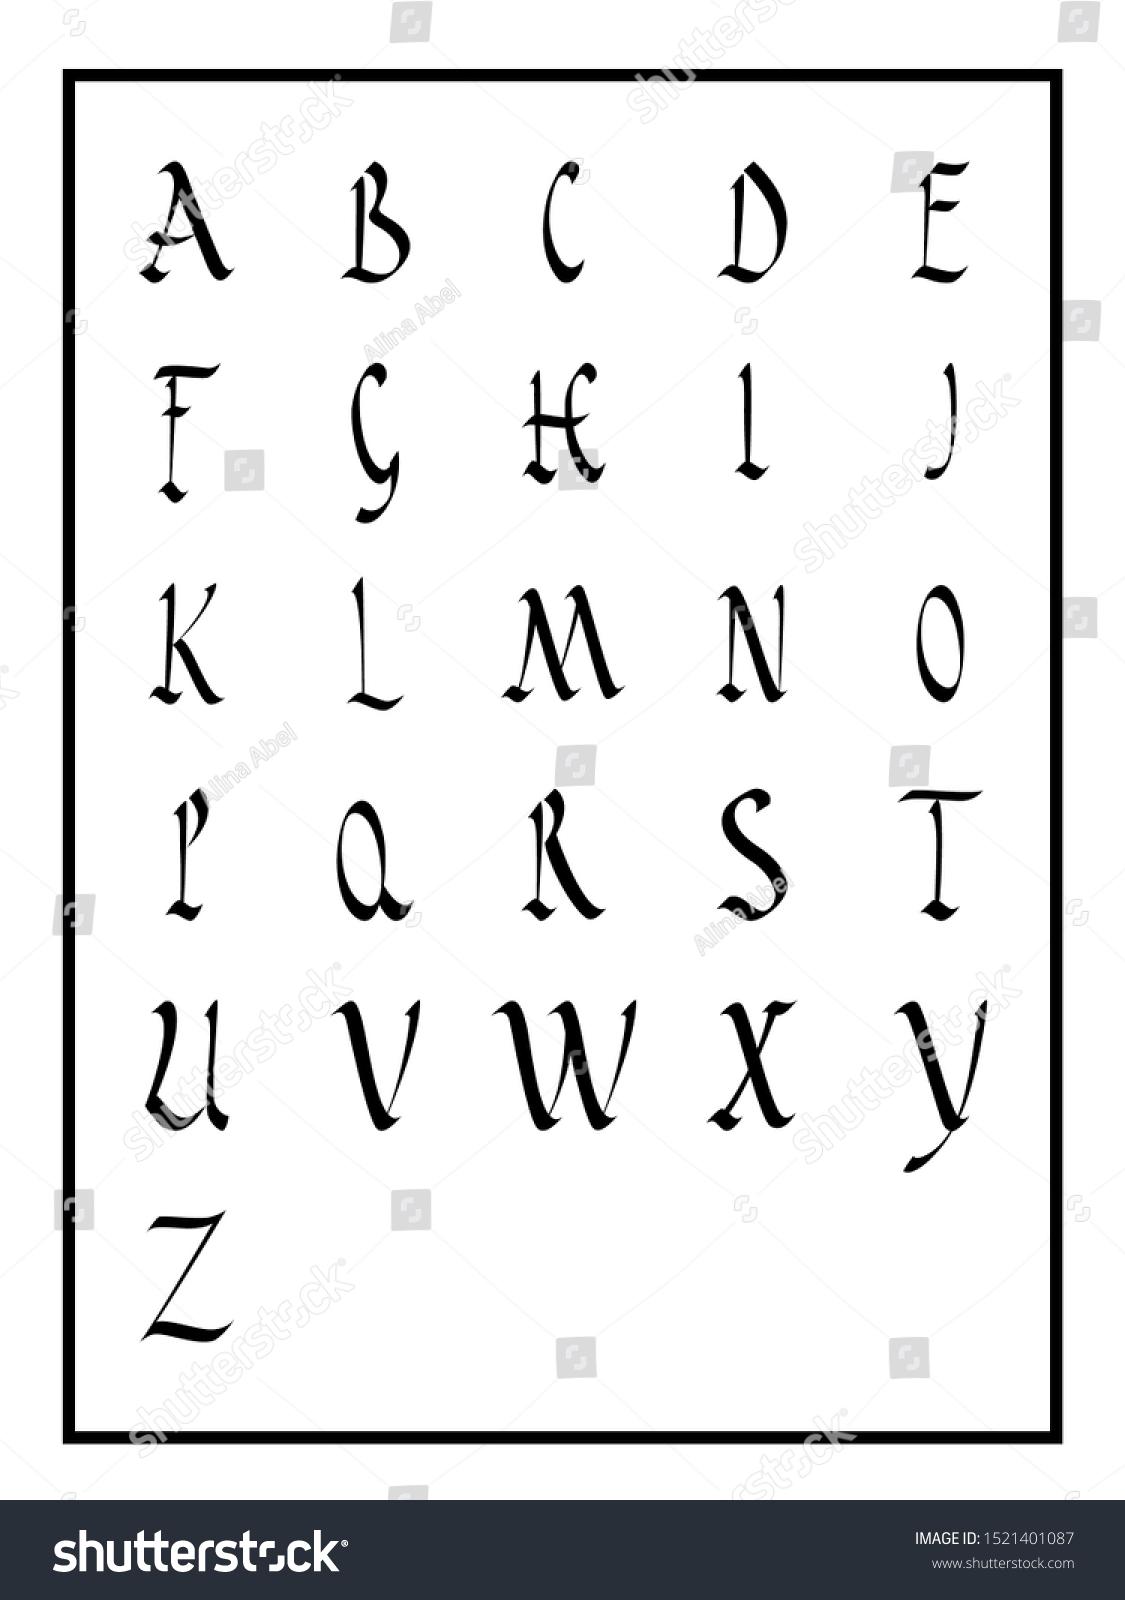 Capital S Calligraphy : capital, calligraphy, Roman, Rustic, Calligraphy, Alphabet, Capitals, Stock, Vector, (Royalty, Free), 1521401087